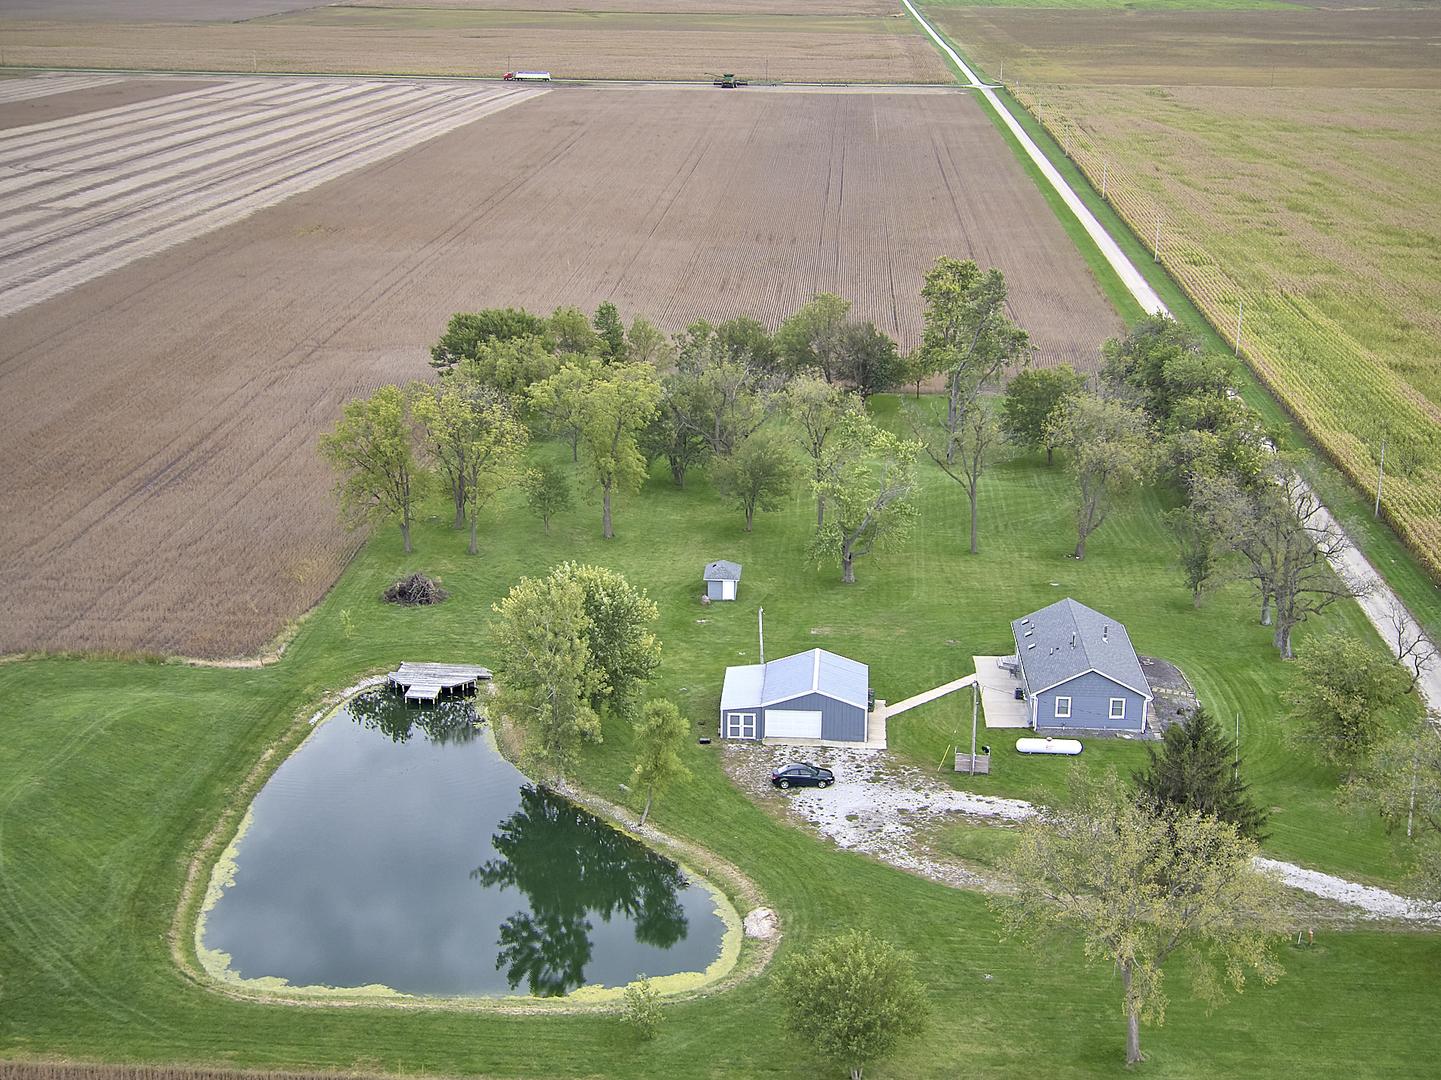 1118 North 300 East, Thawville, Illinois, 60968